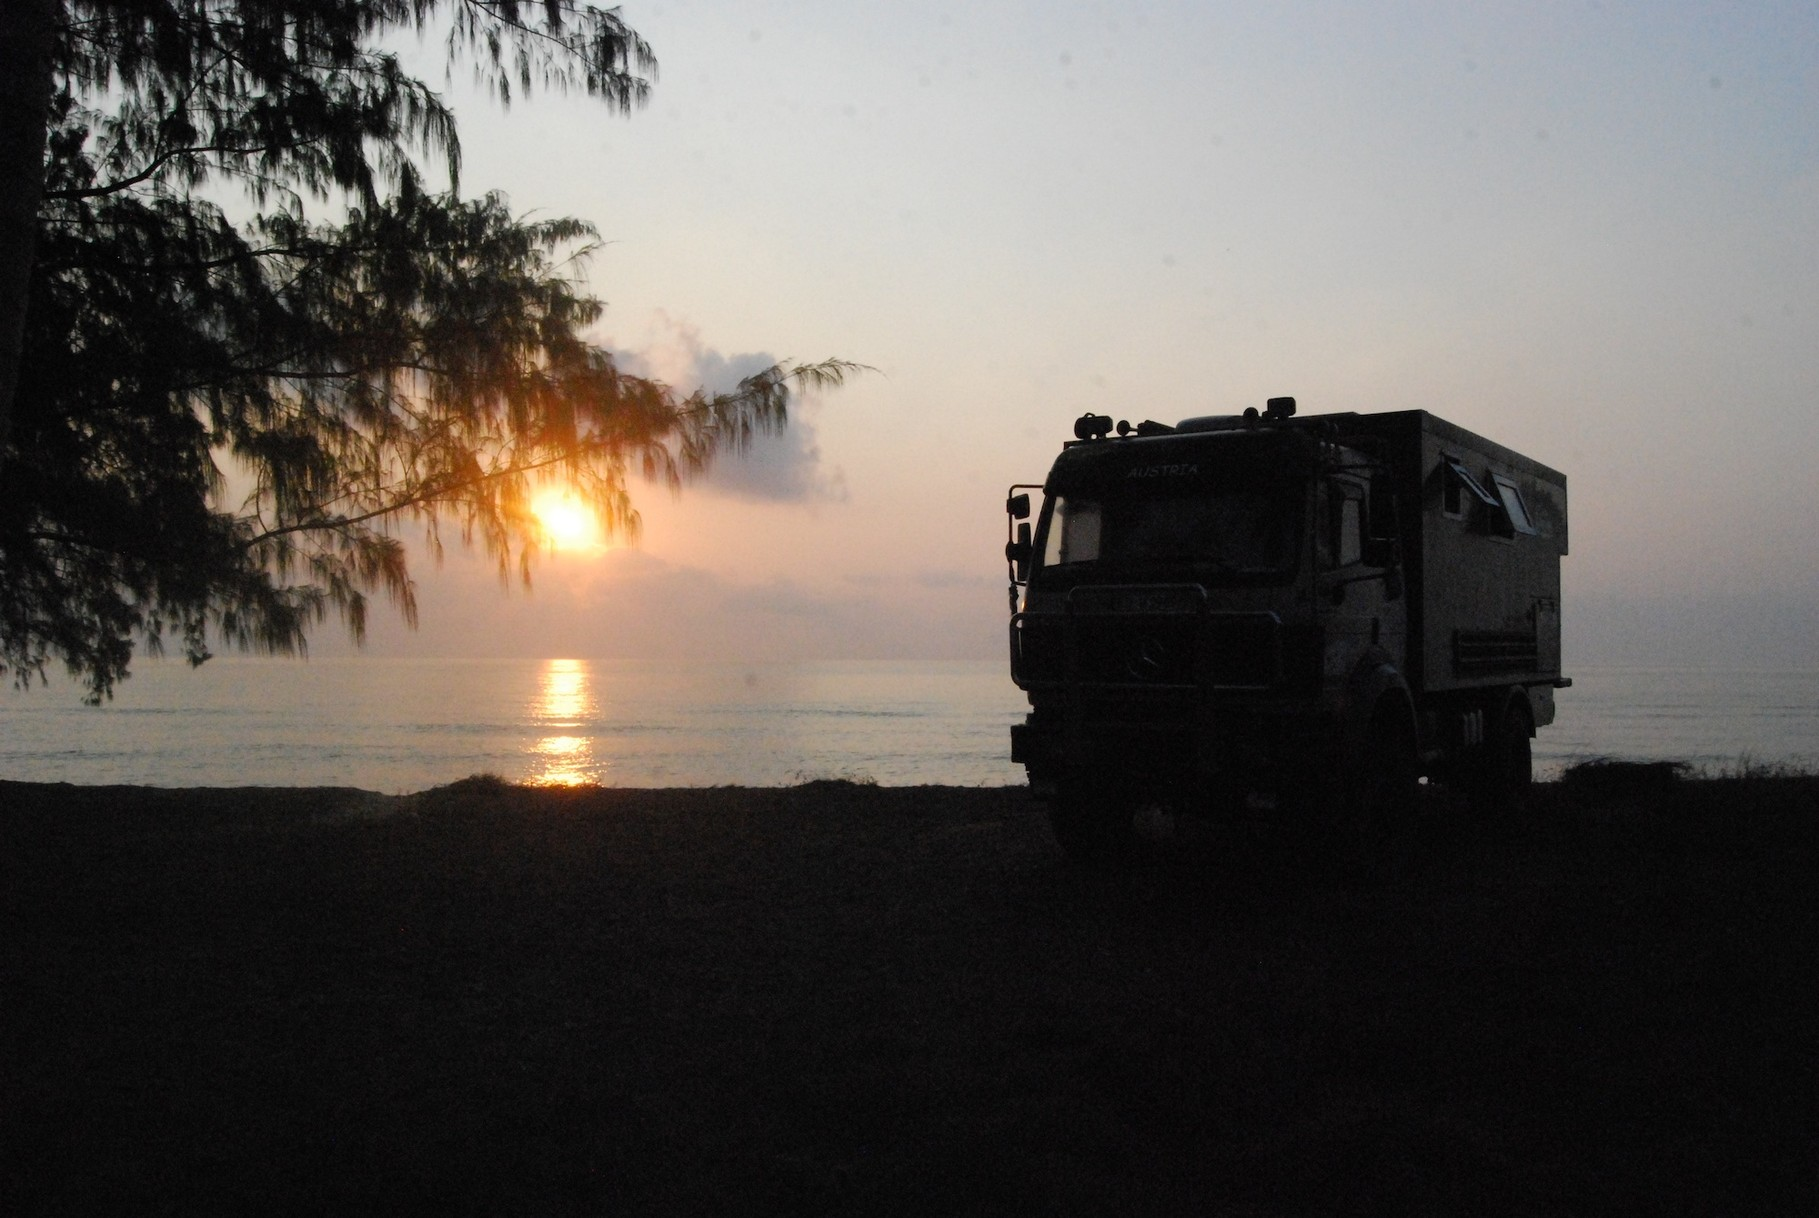 Sonnenuntergang in Ban Krut